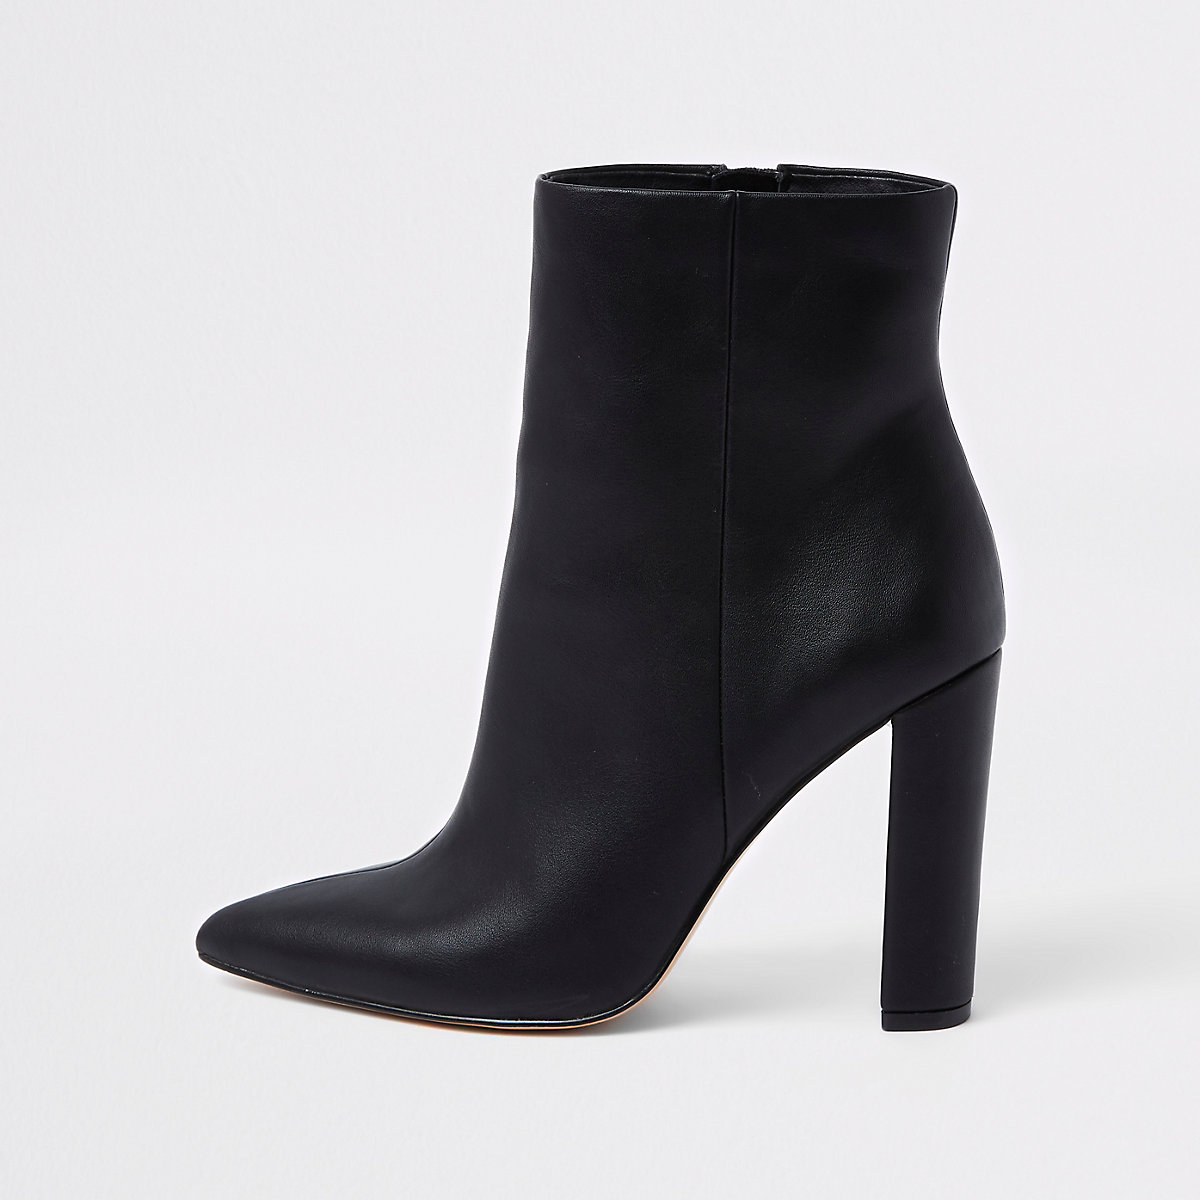 Zwarte puntige laarzen met blokhak